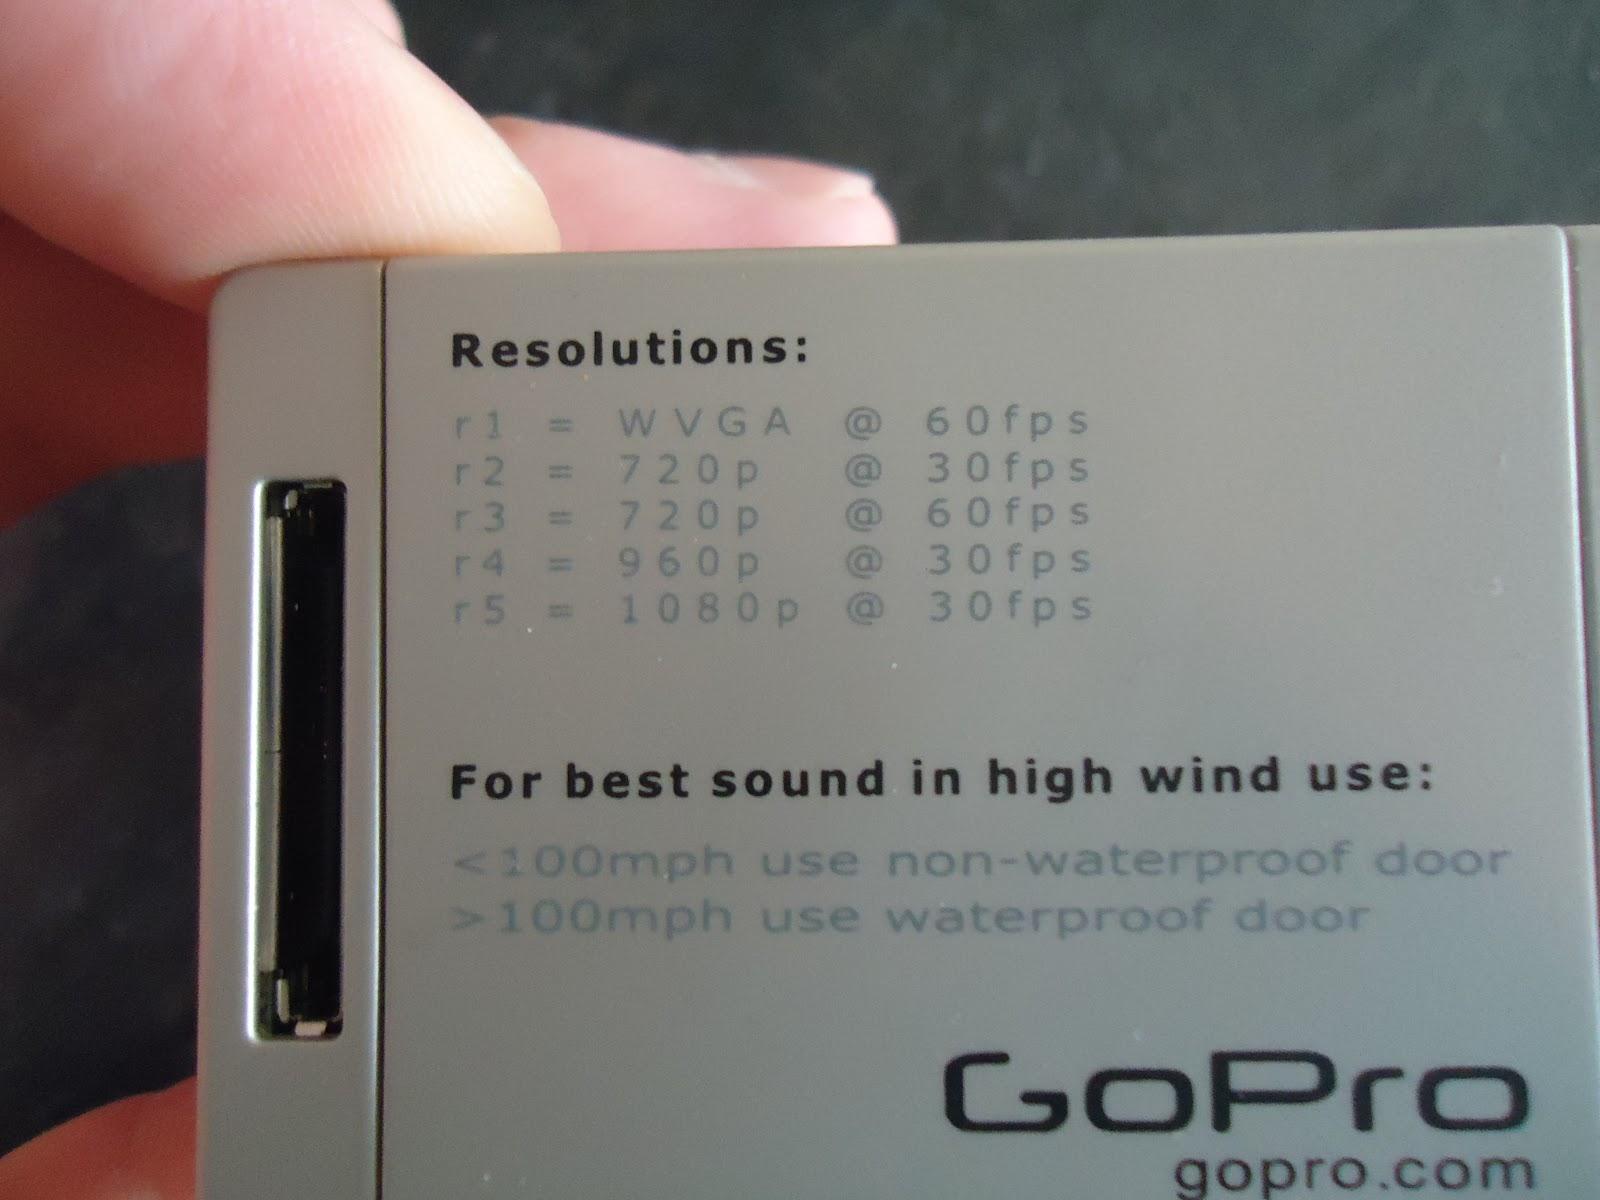 gopro chest strap instructions